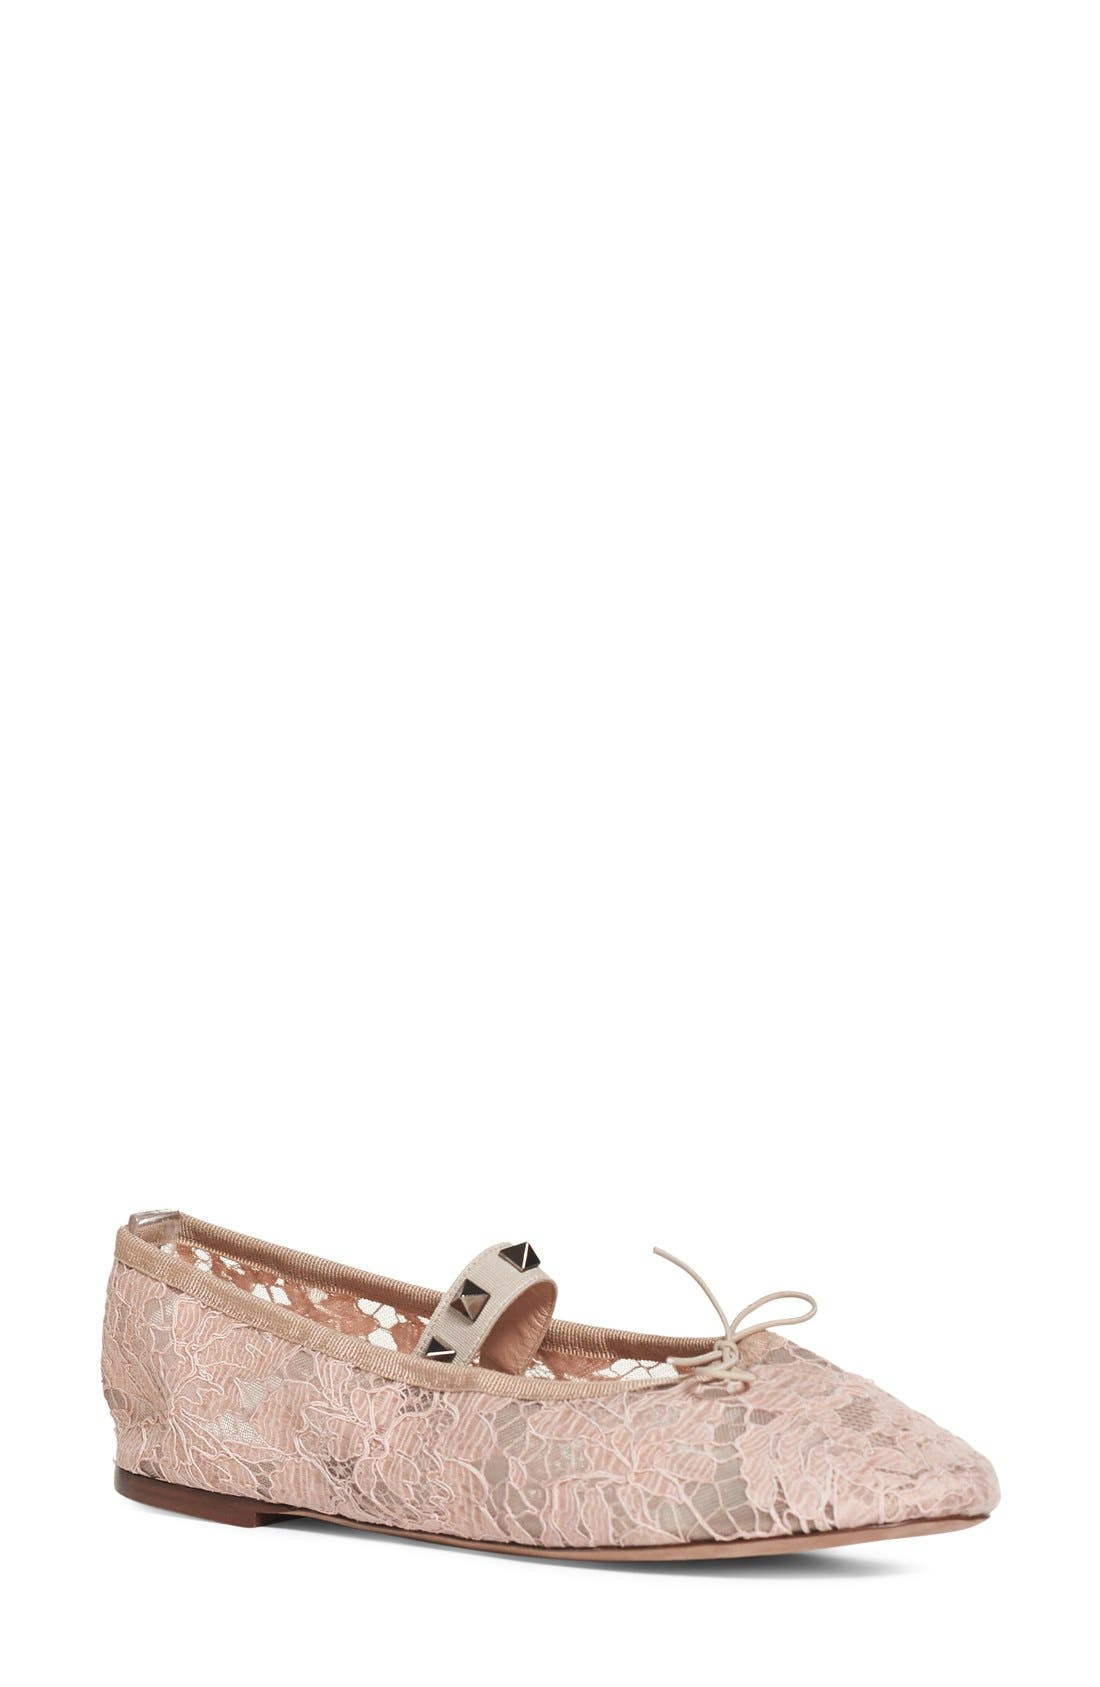 Alternate Image 1 Selected - Valentino 'Rockstud' Lace Ballet Flat (Women)